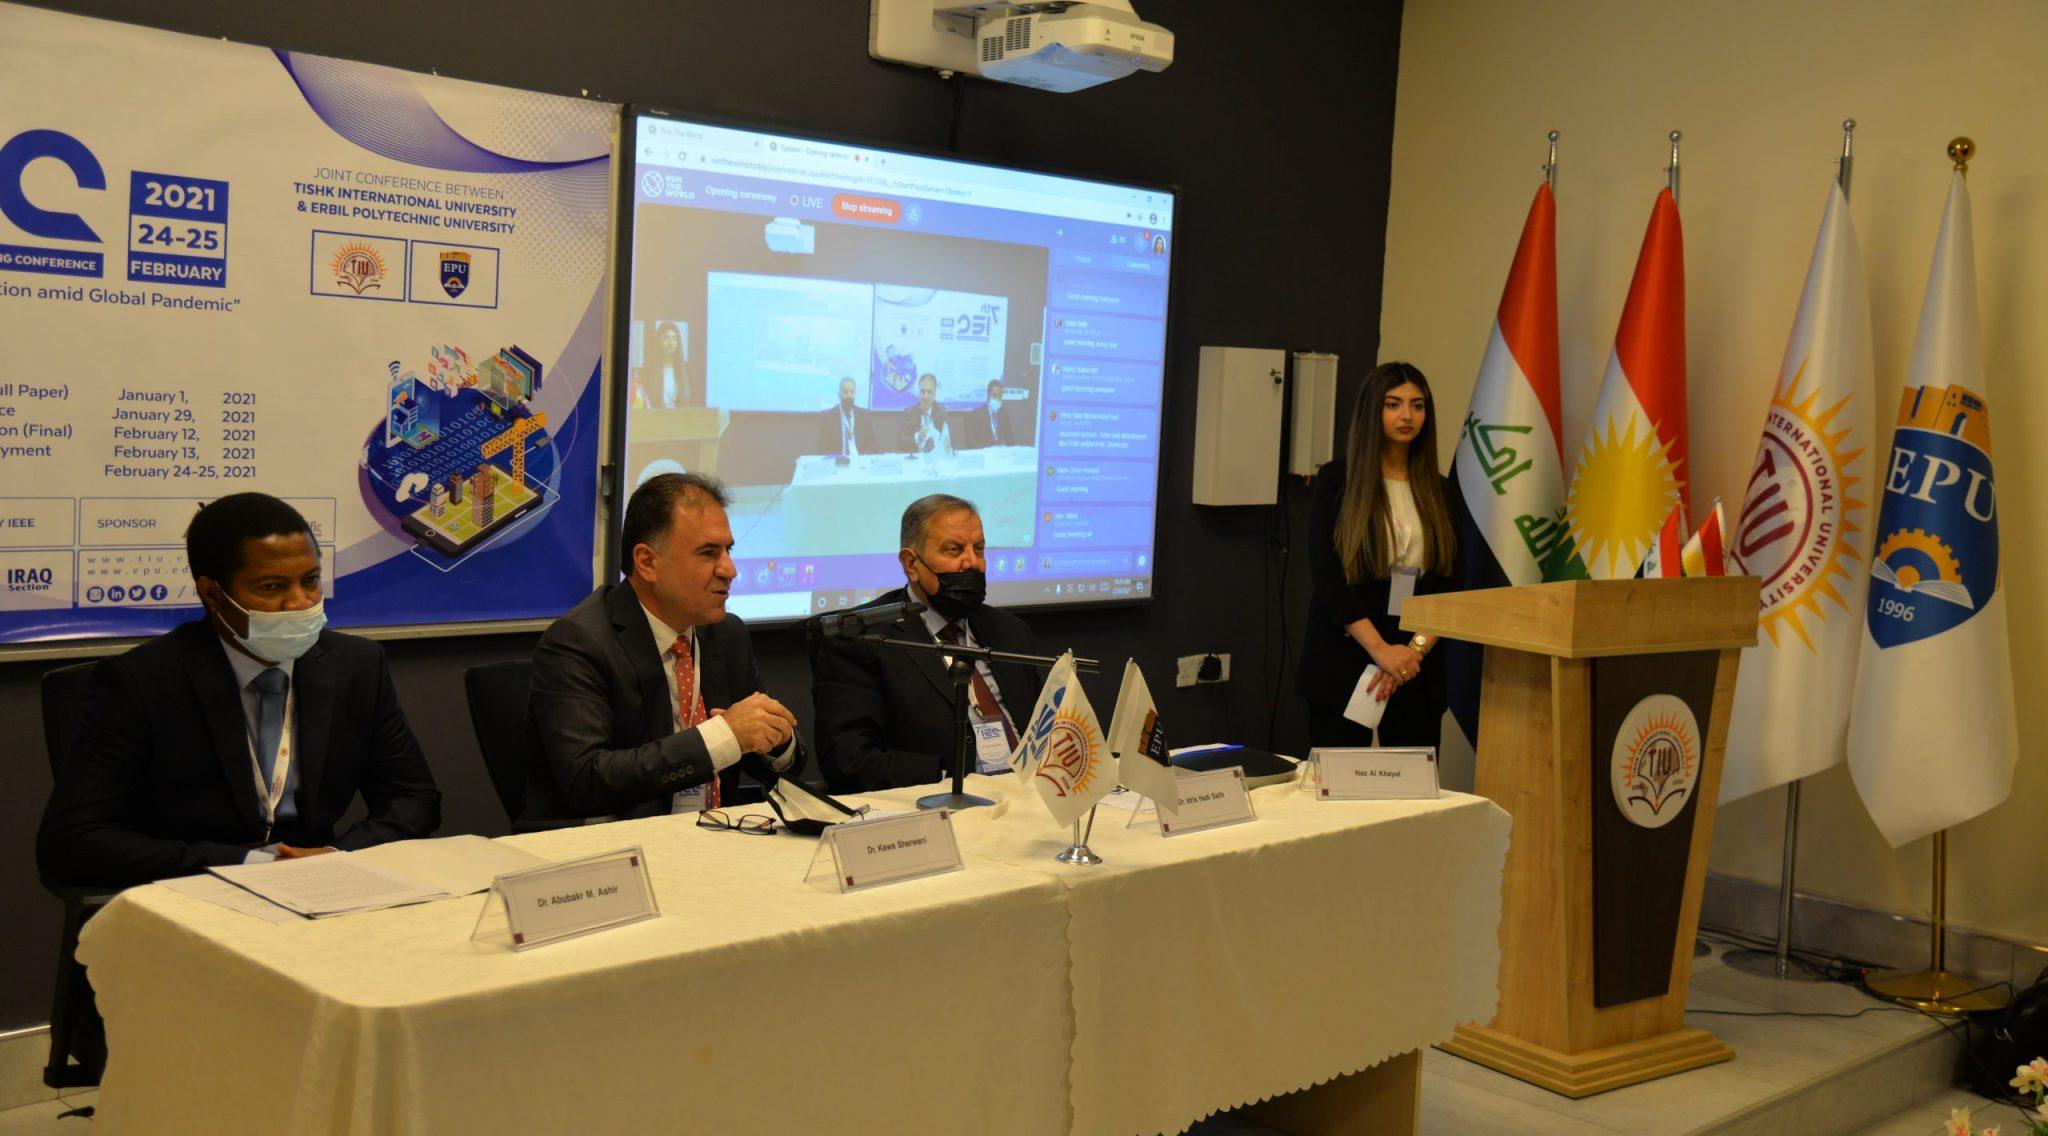 7th International Conference Has Been Held Between Erbil Polytechnic University And TISHK International University